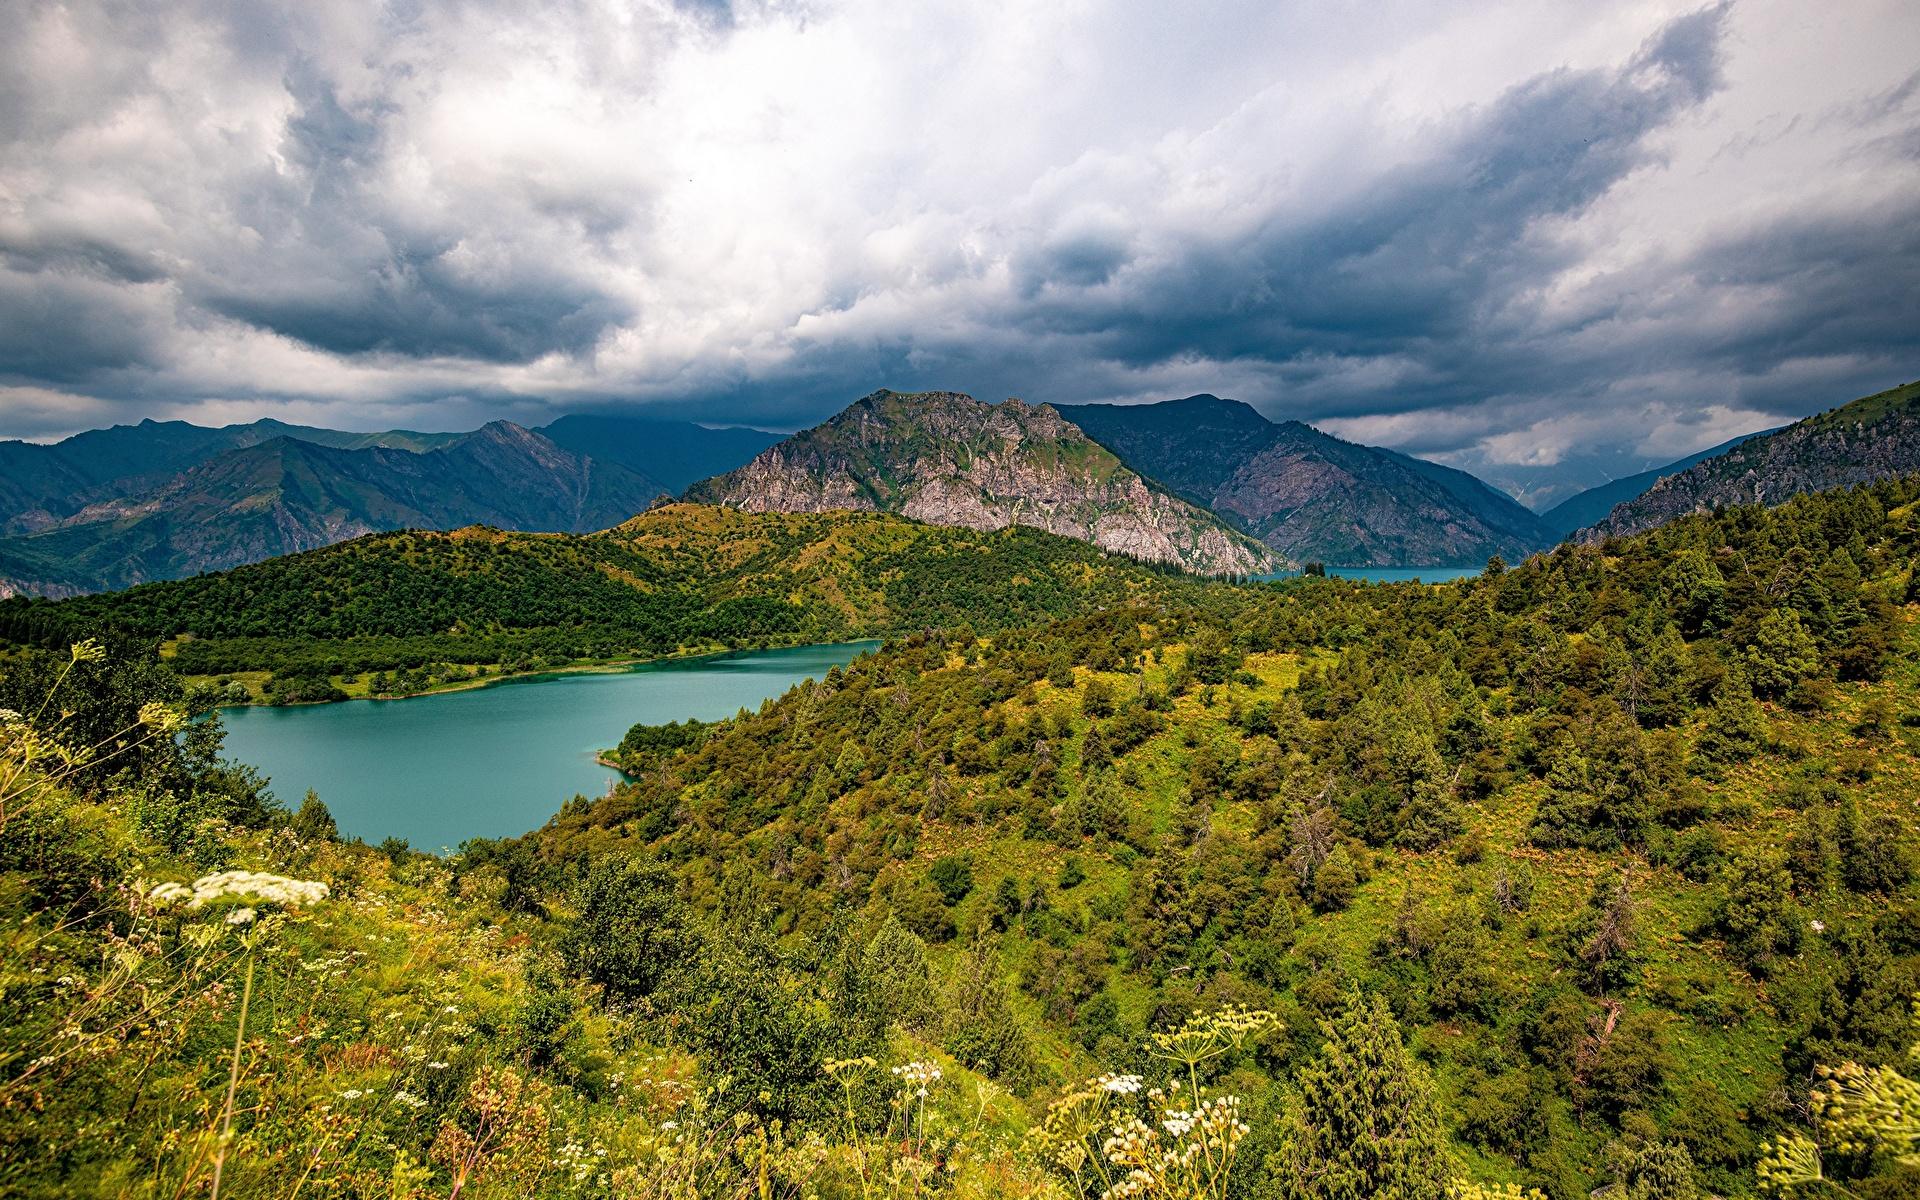 Картинки Sary-Chelek Lake, Kyrgyzstan гора Природа Озеро облачно 1920x1200 Горы Облака облако